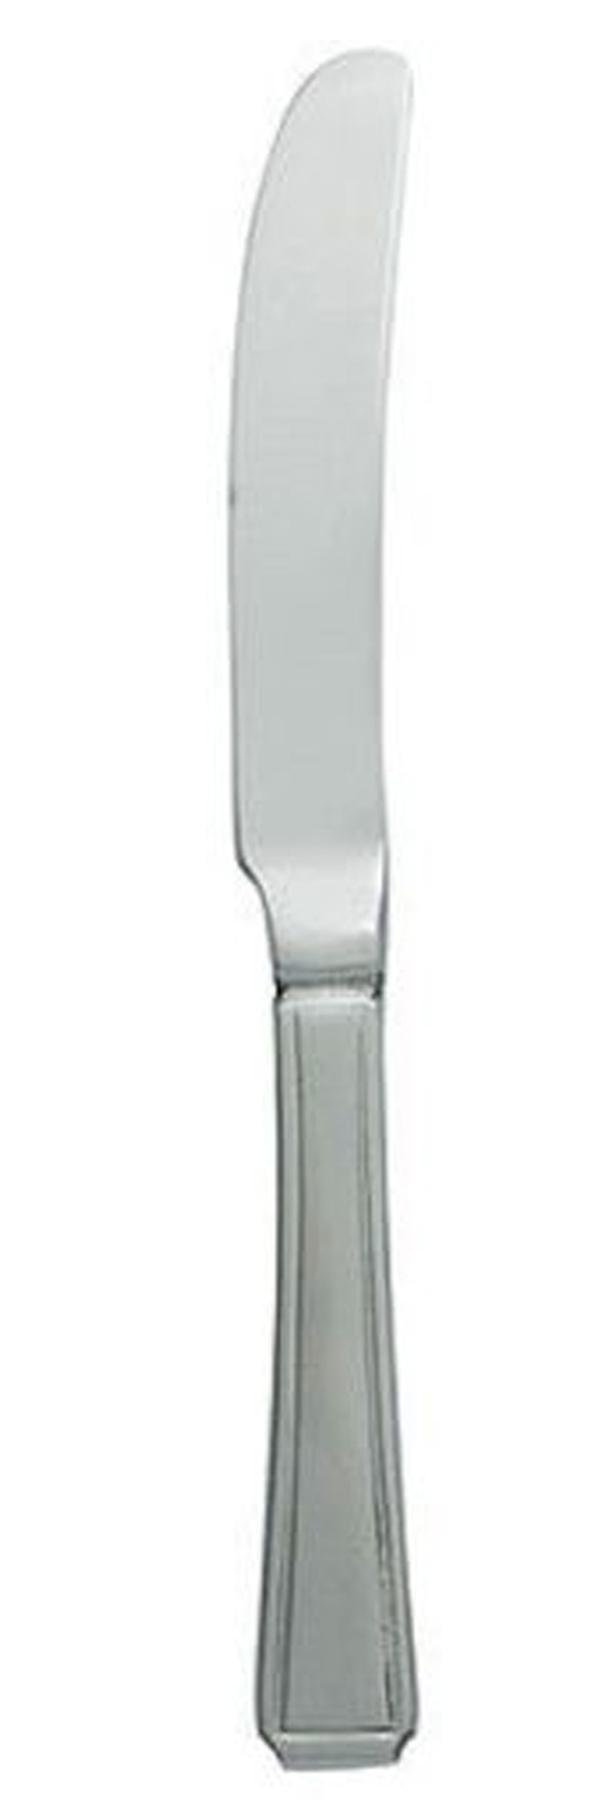 oneida harley stainless steel table knife 8802001 set of 4 oneida 2 piece triple rivet chefs cutlery set cutlery